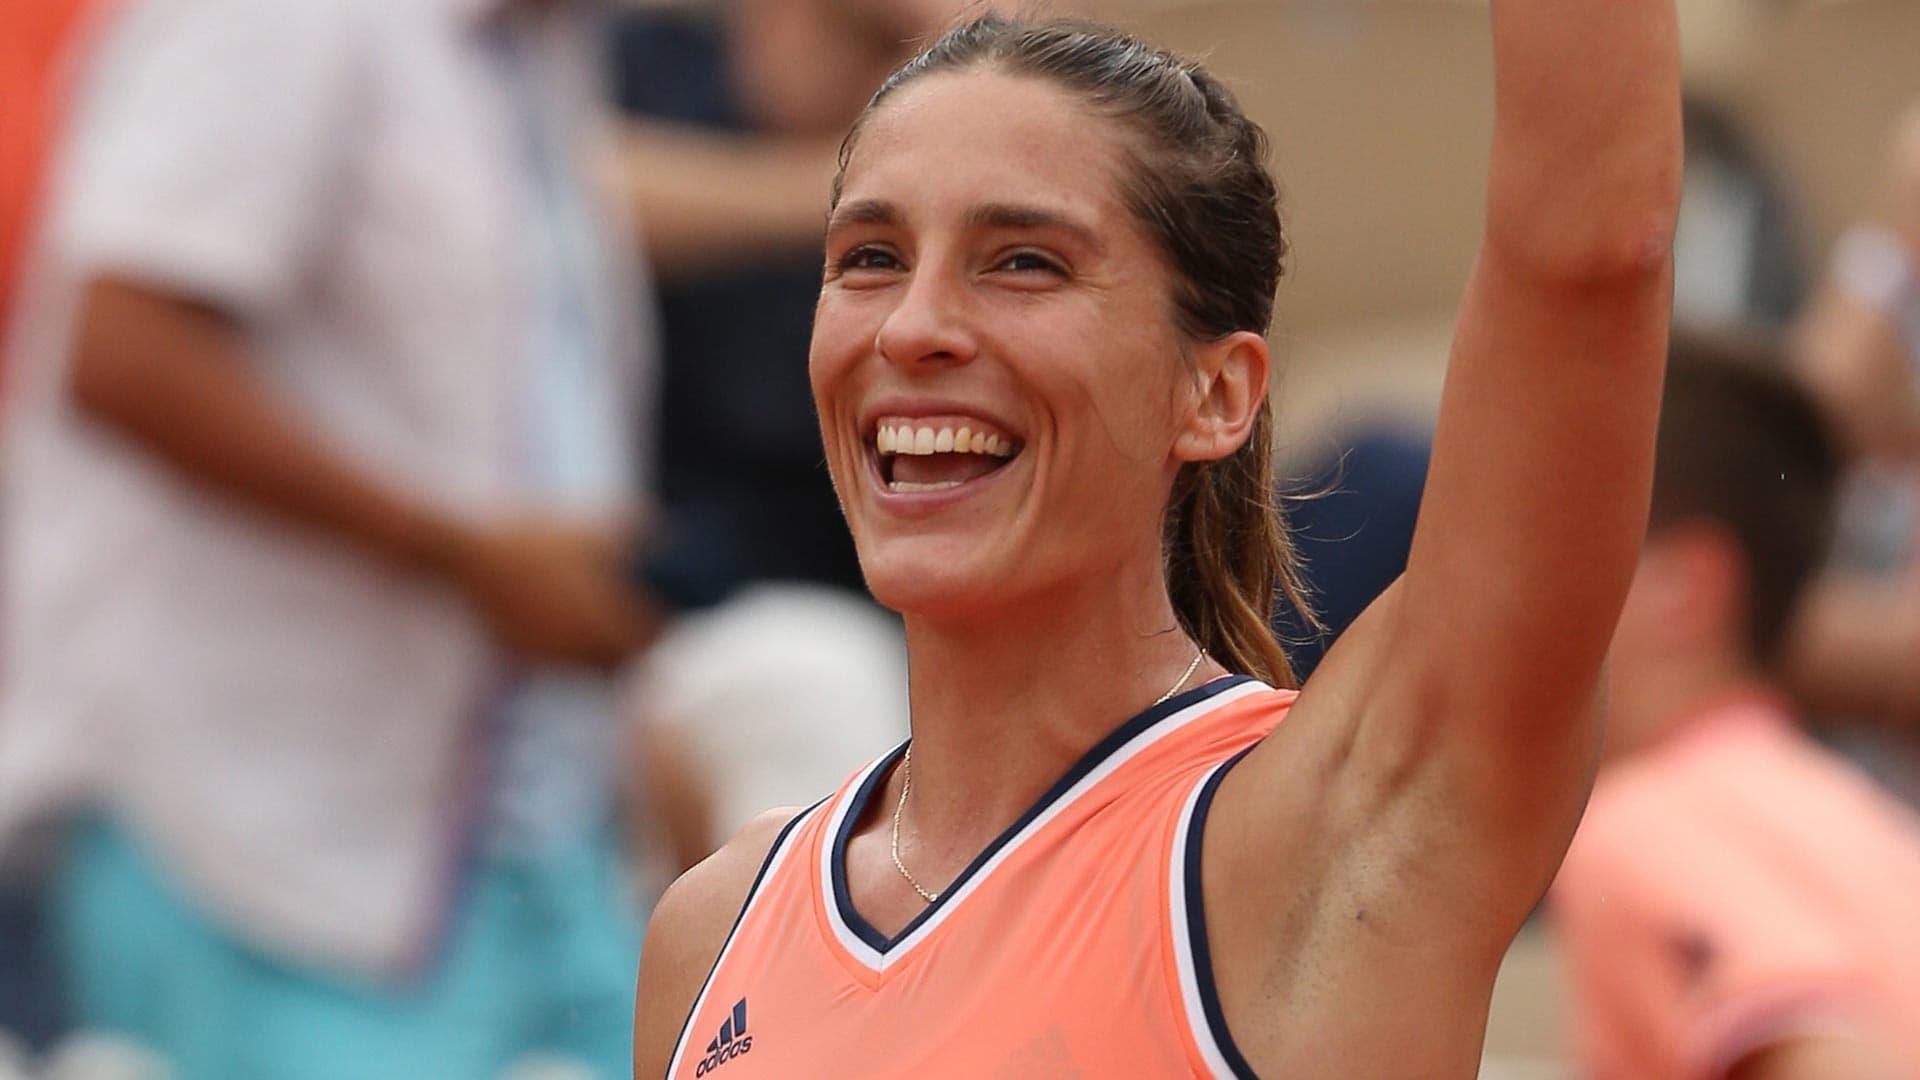 6 WTA TITEL MIT DER TU – ANDREA PETKOVIC